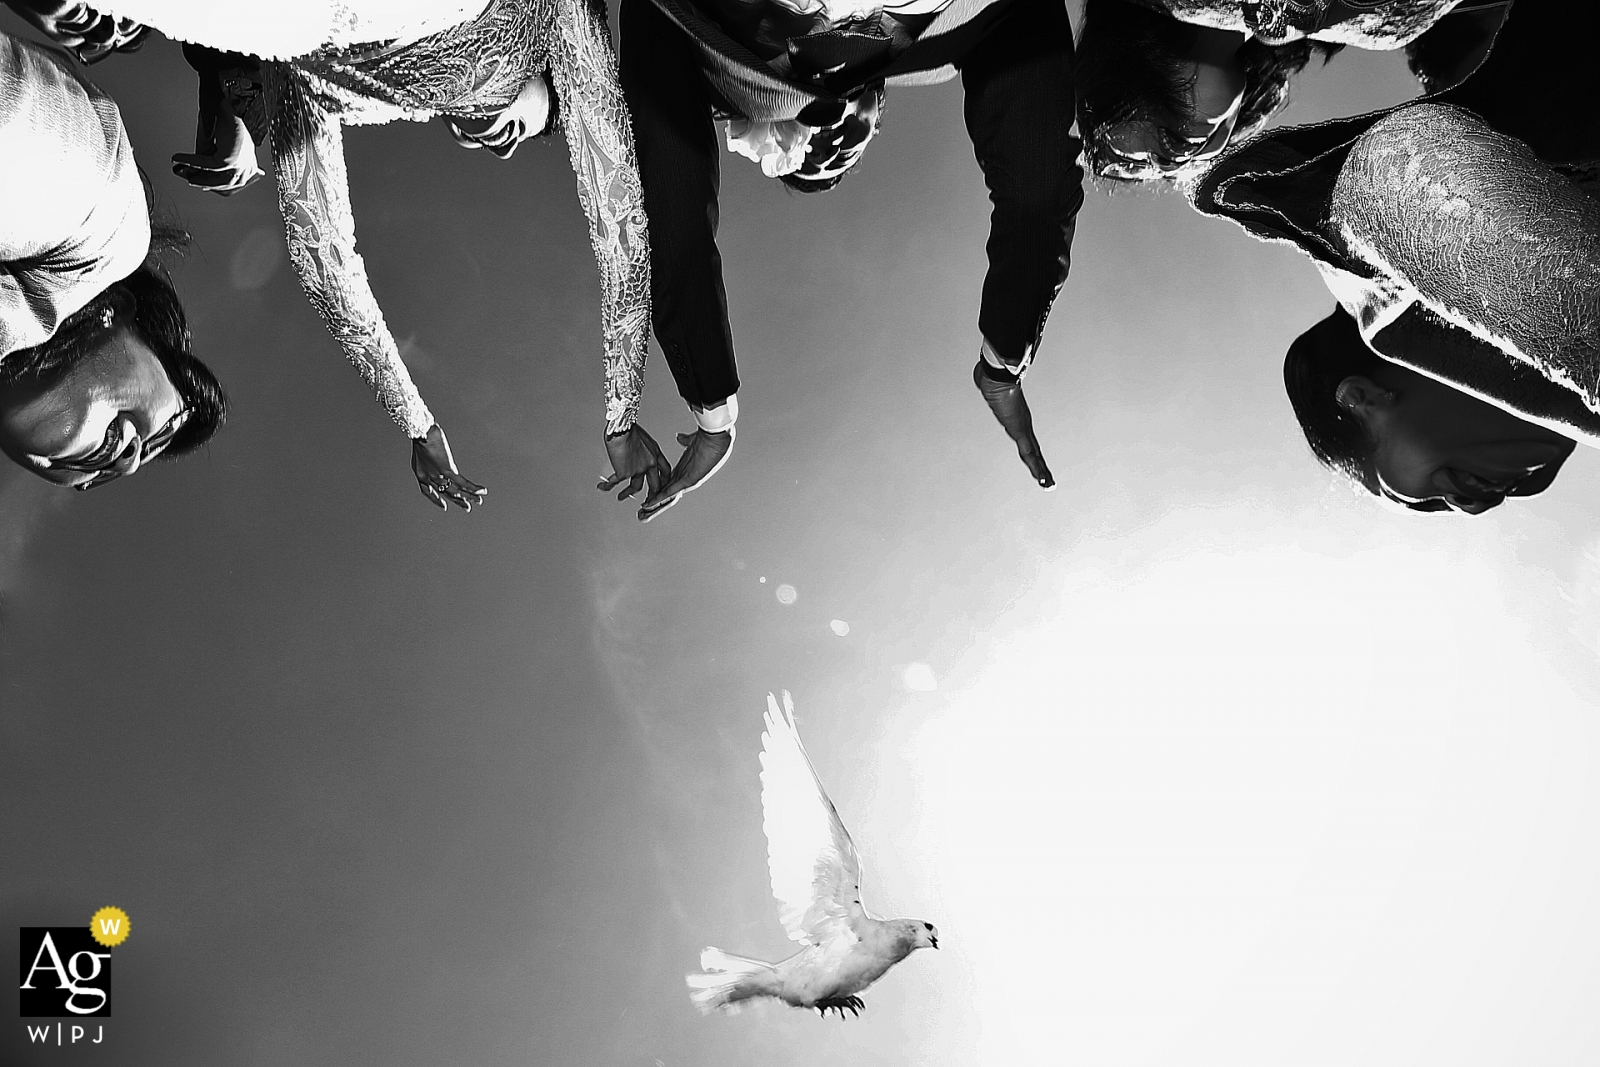 Franck Boutonnet is an artistic wedding photographer for